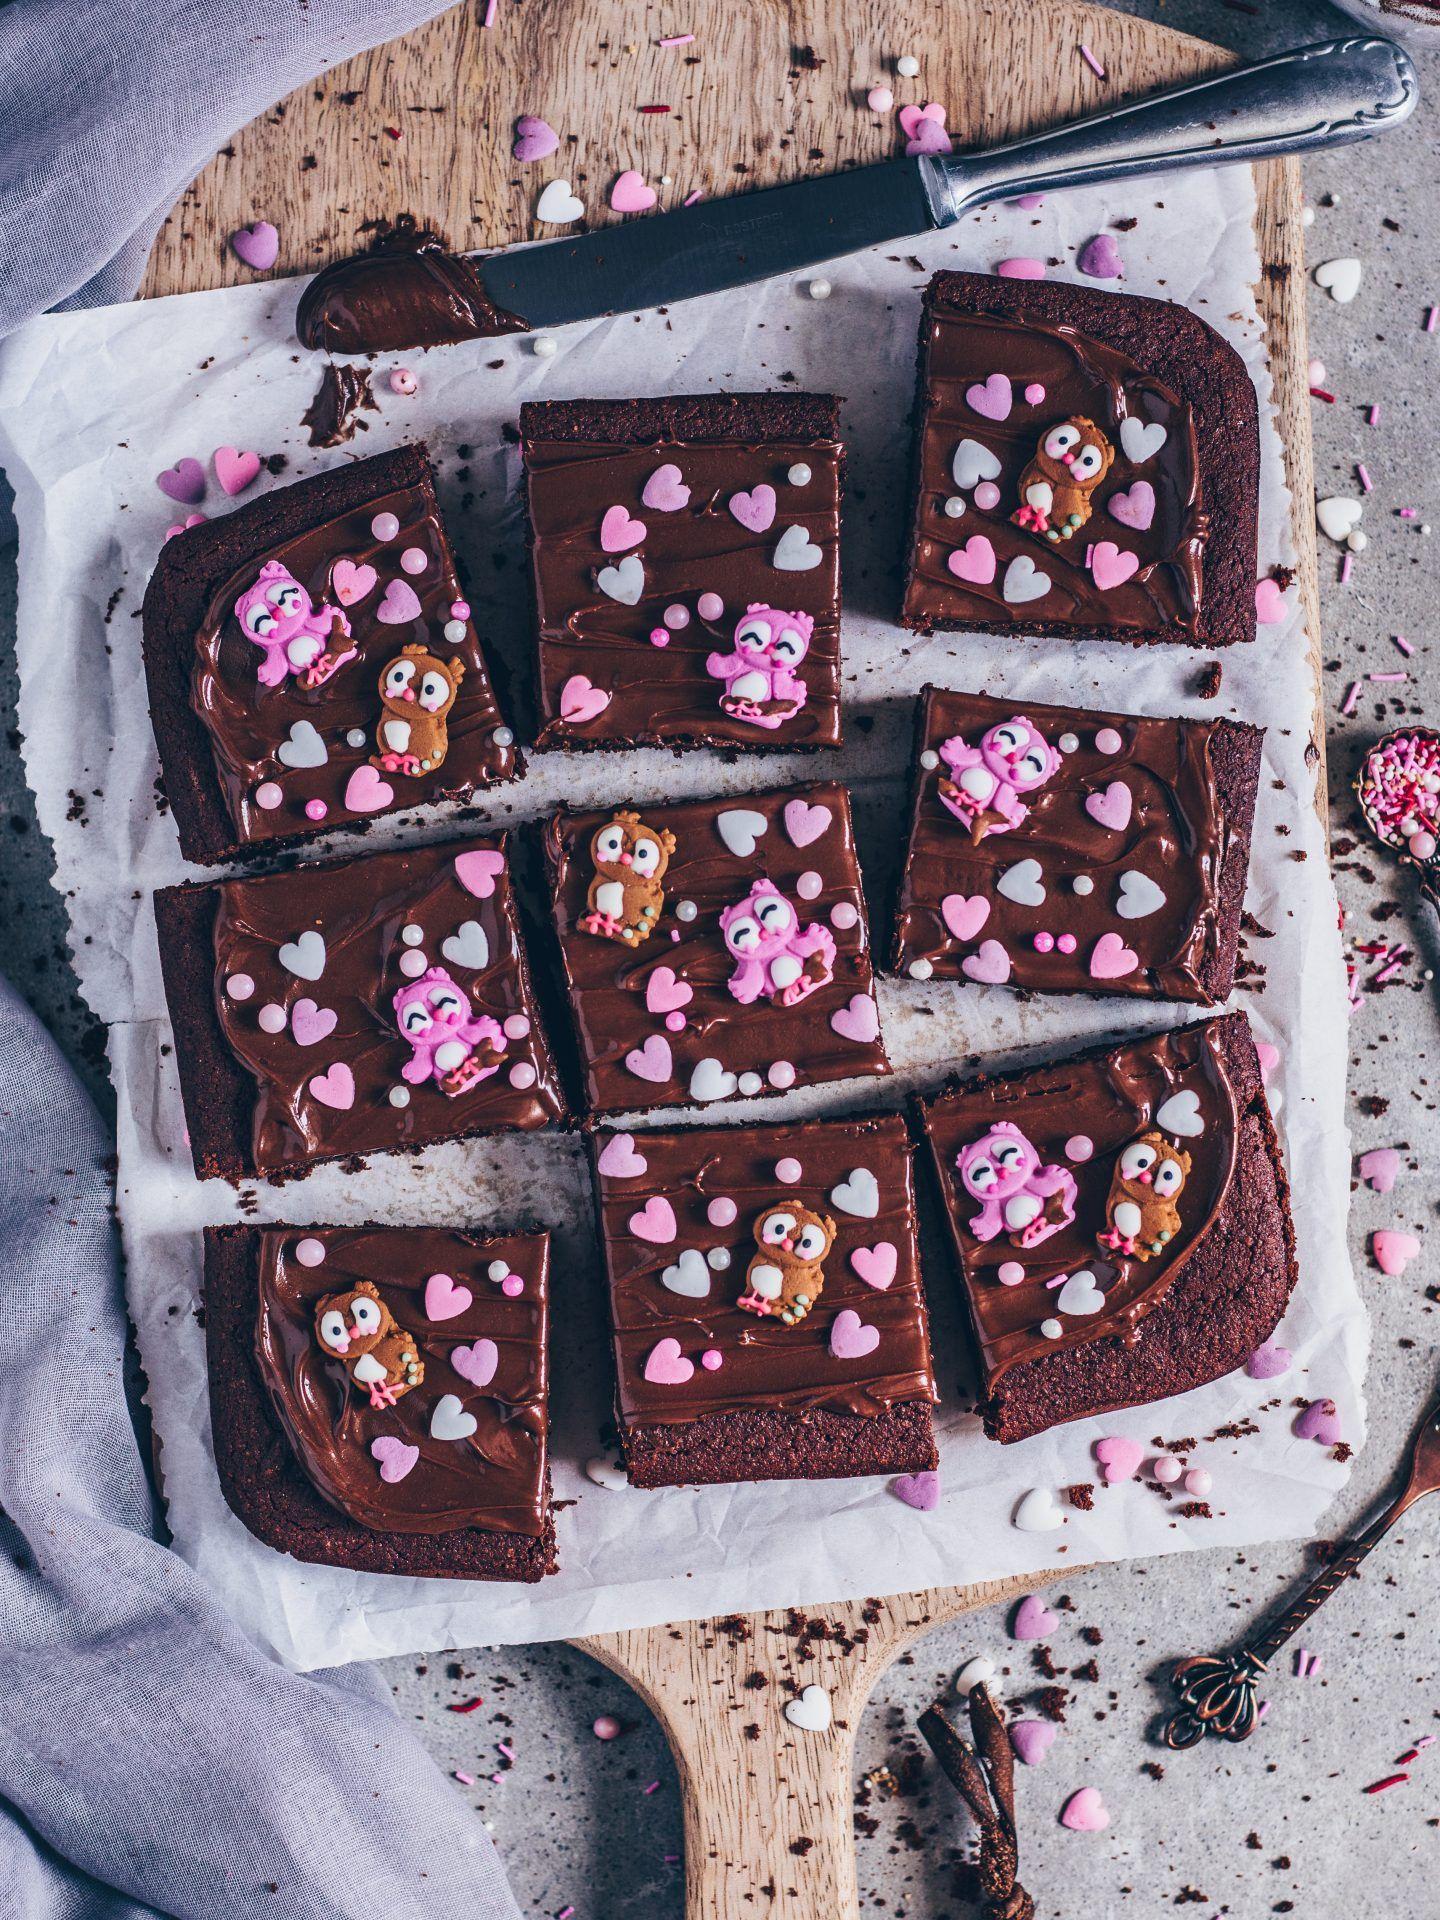 Vegan brownies with chocolate cream icing (simple recipe) – Bianca Zapatka | recipes